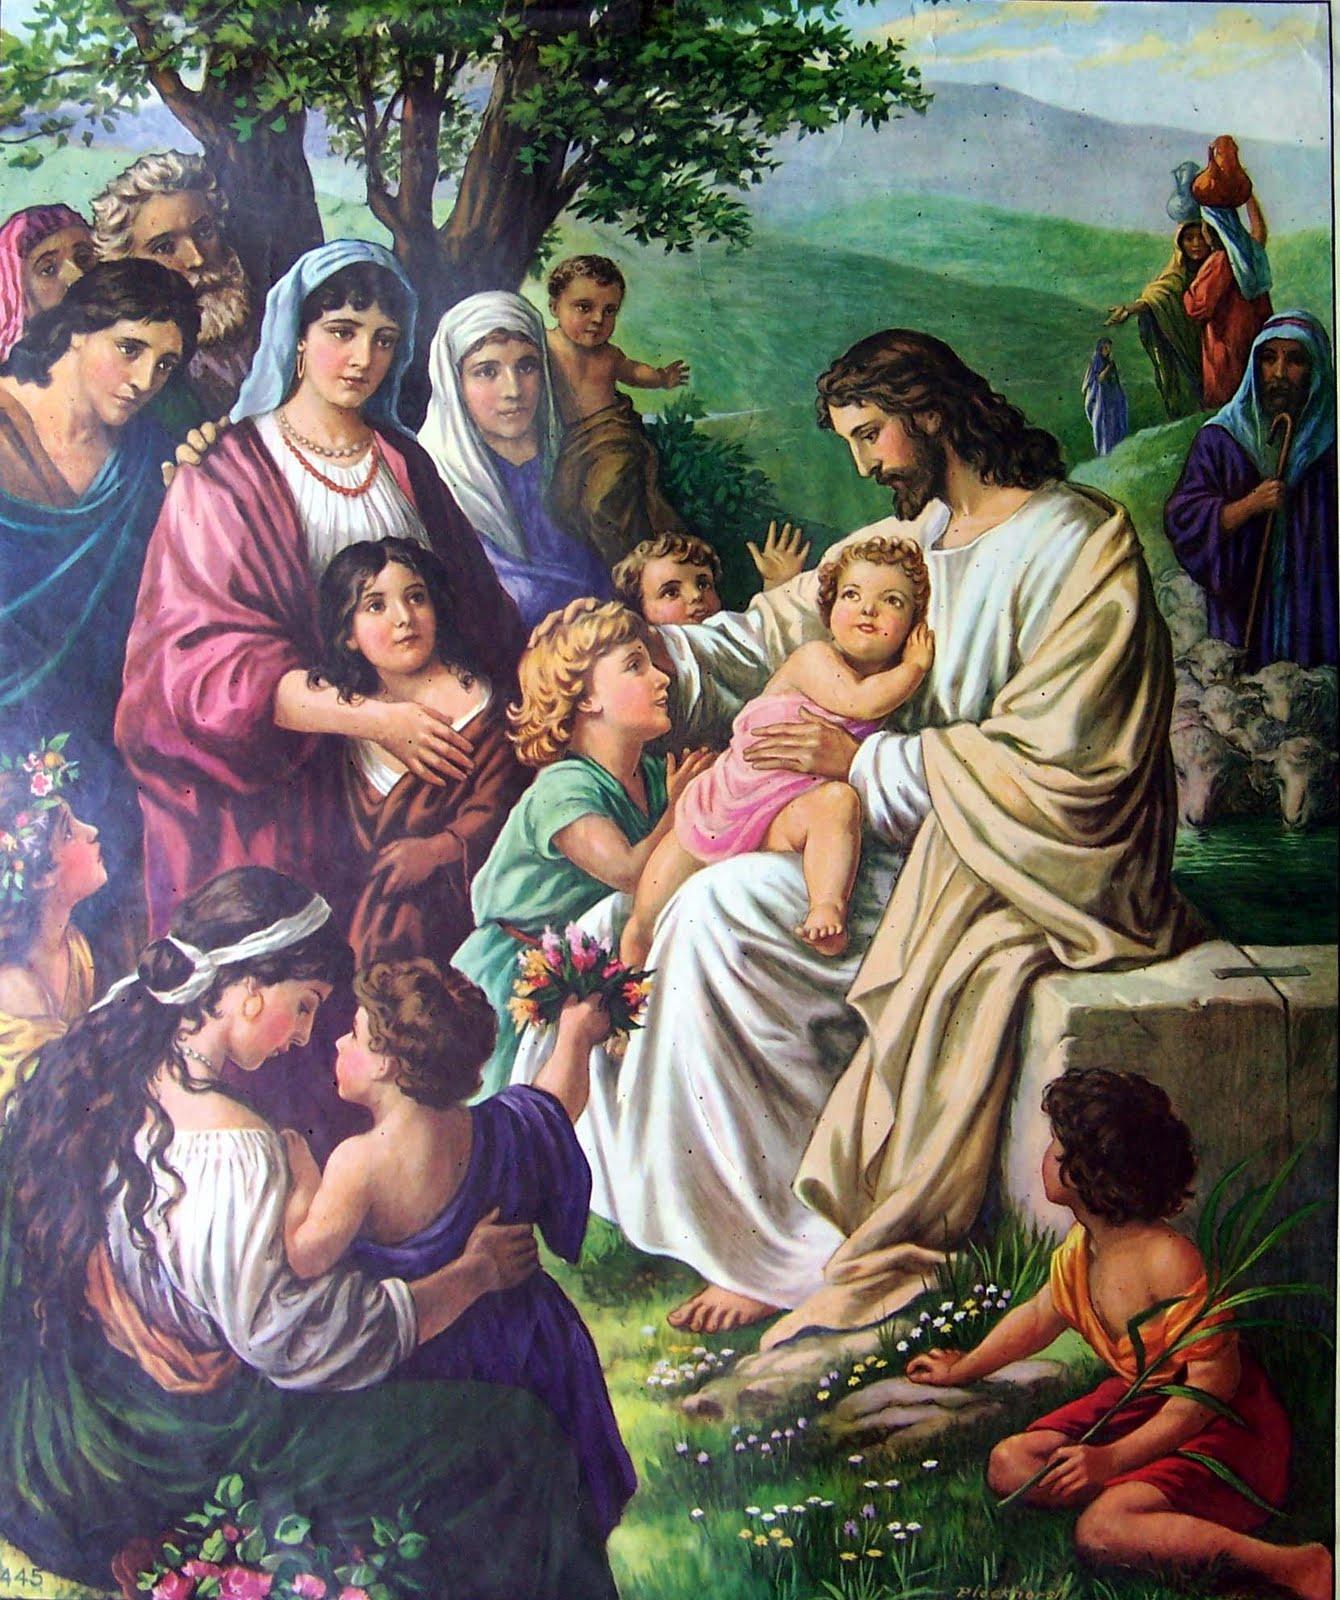 Христианские и картинки